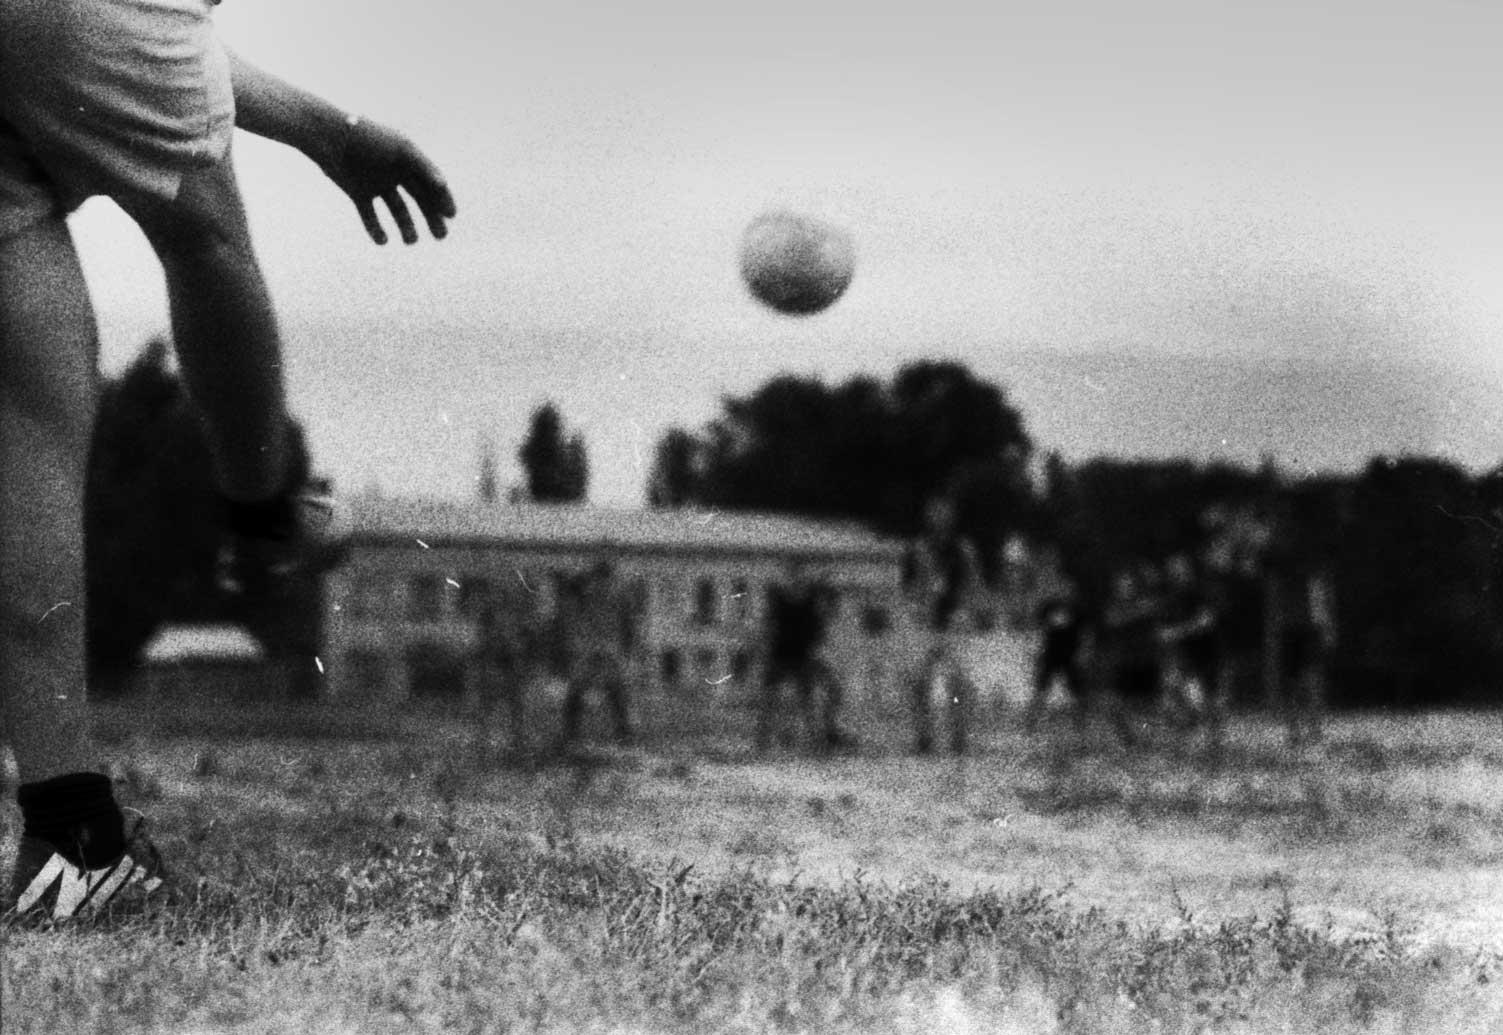 Футбол на пленочный фотоаппарат